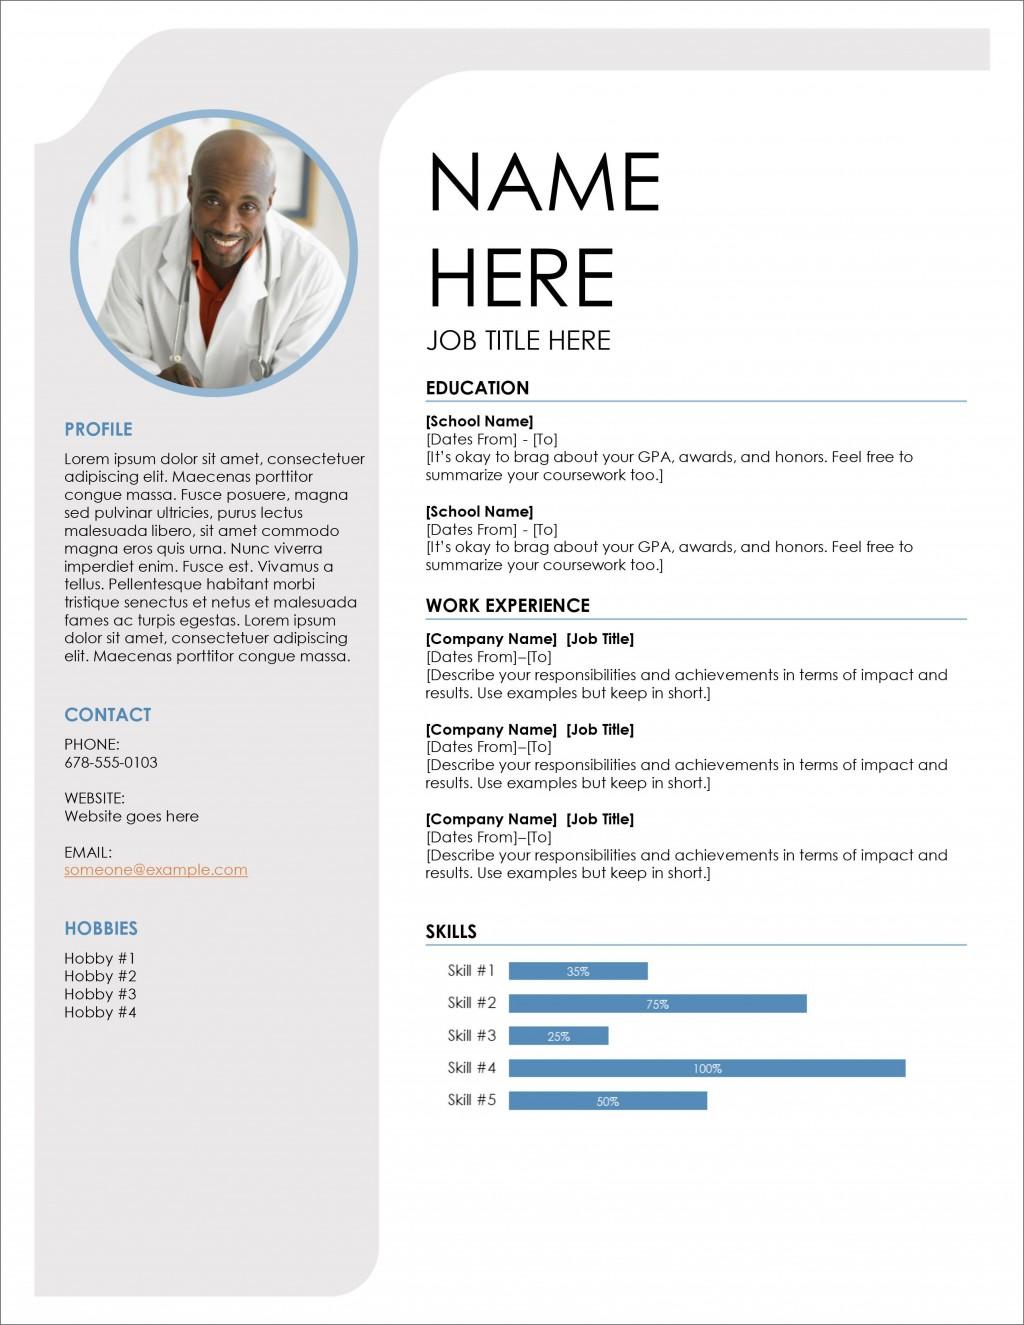 008 Wondrou Free Professional Resume Template Microsoft Word High Definition  Cv 2010Large